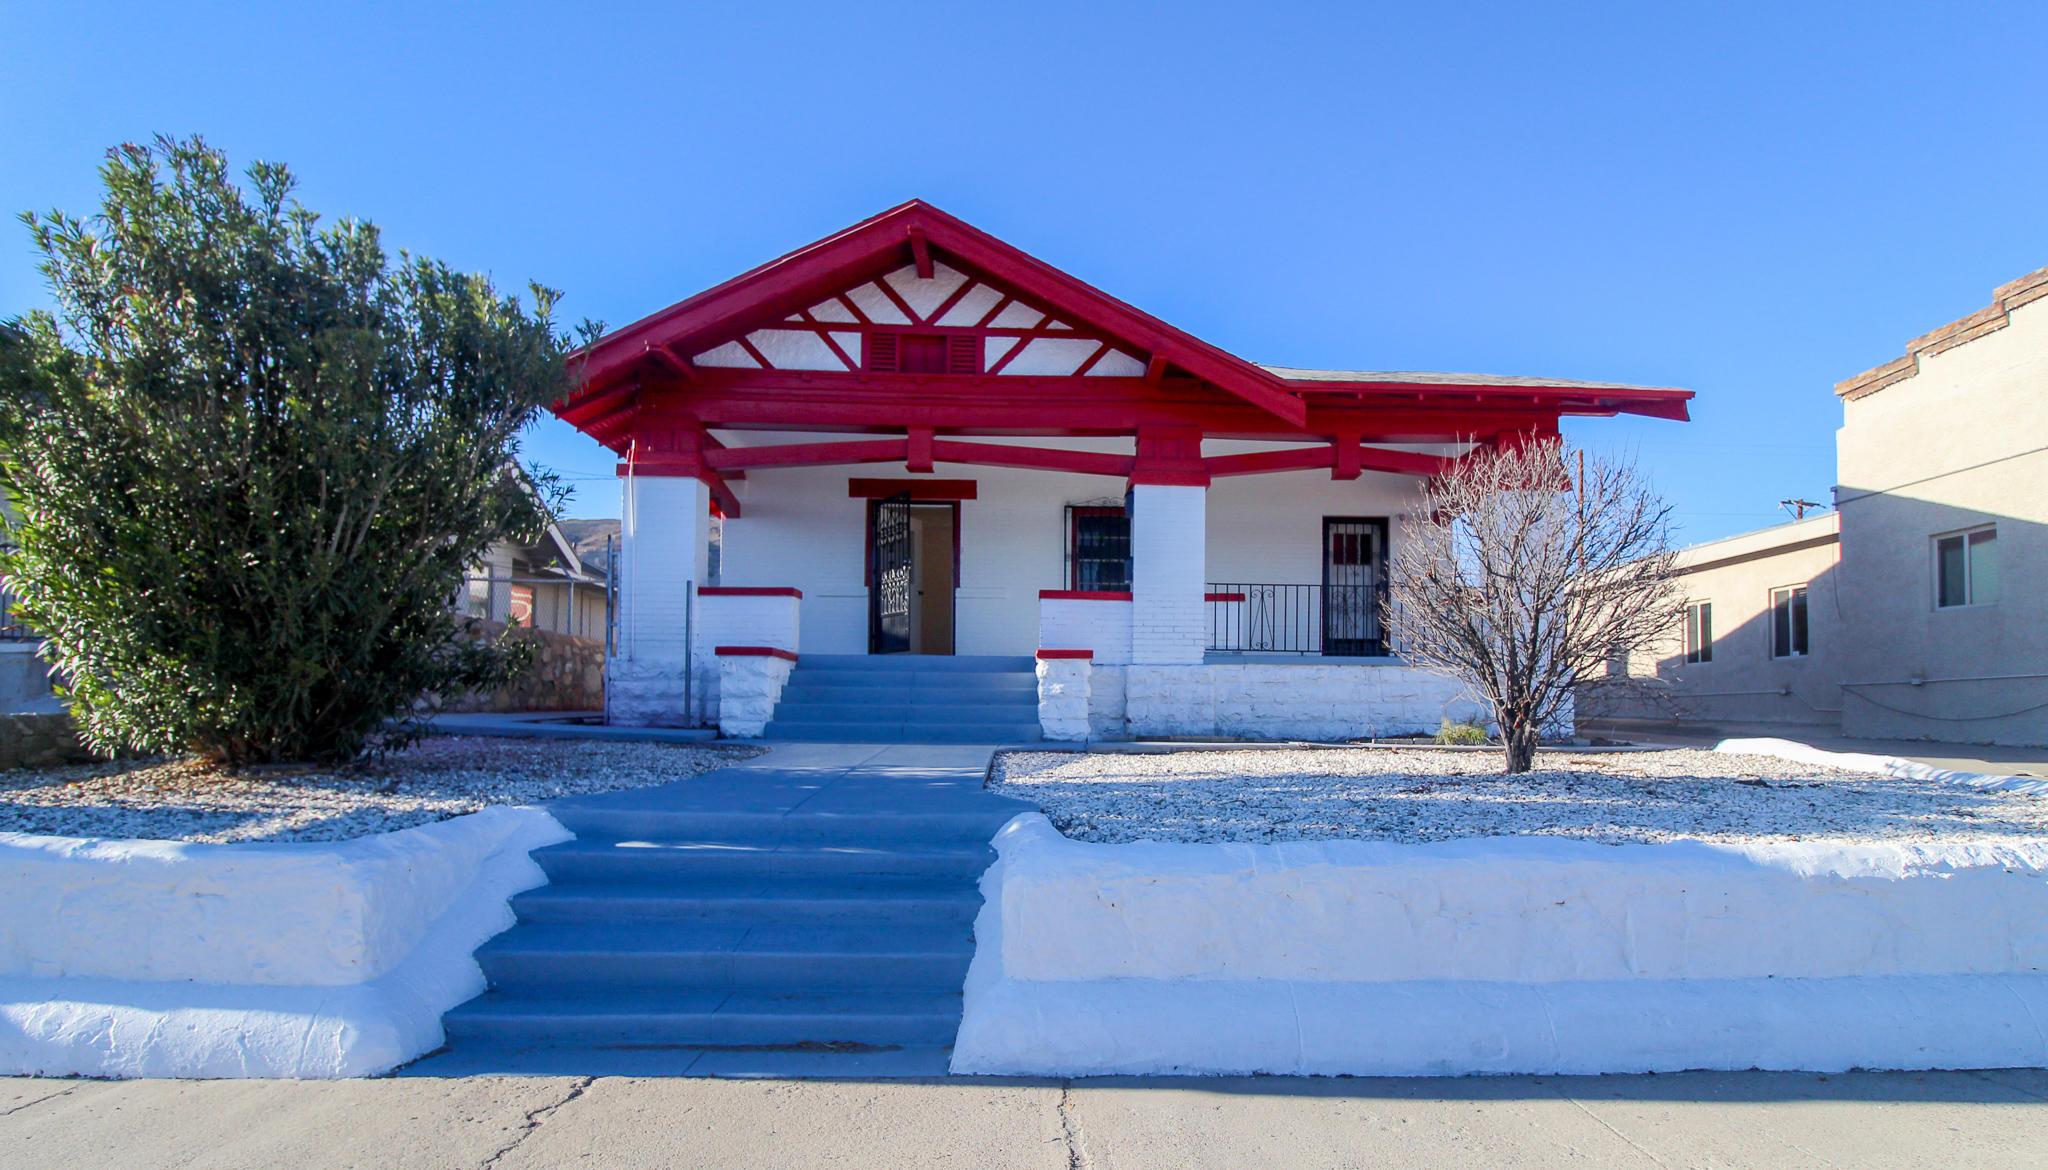 2315 MONTANA Avenue, El Paso, Texas 79903, 1 Bedroom Bedrooms, ,1 BathroomBathrooms,Residential Rental,For Rent,MONTANA,843070